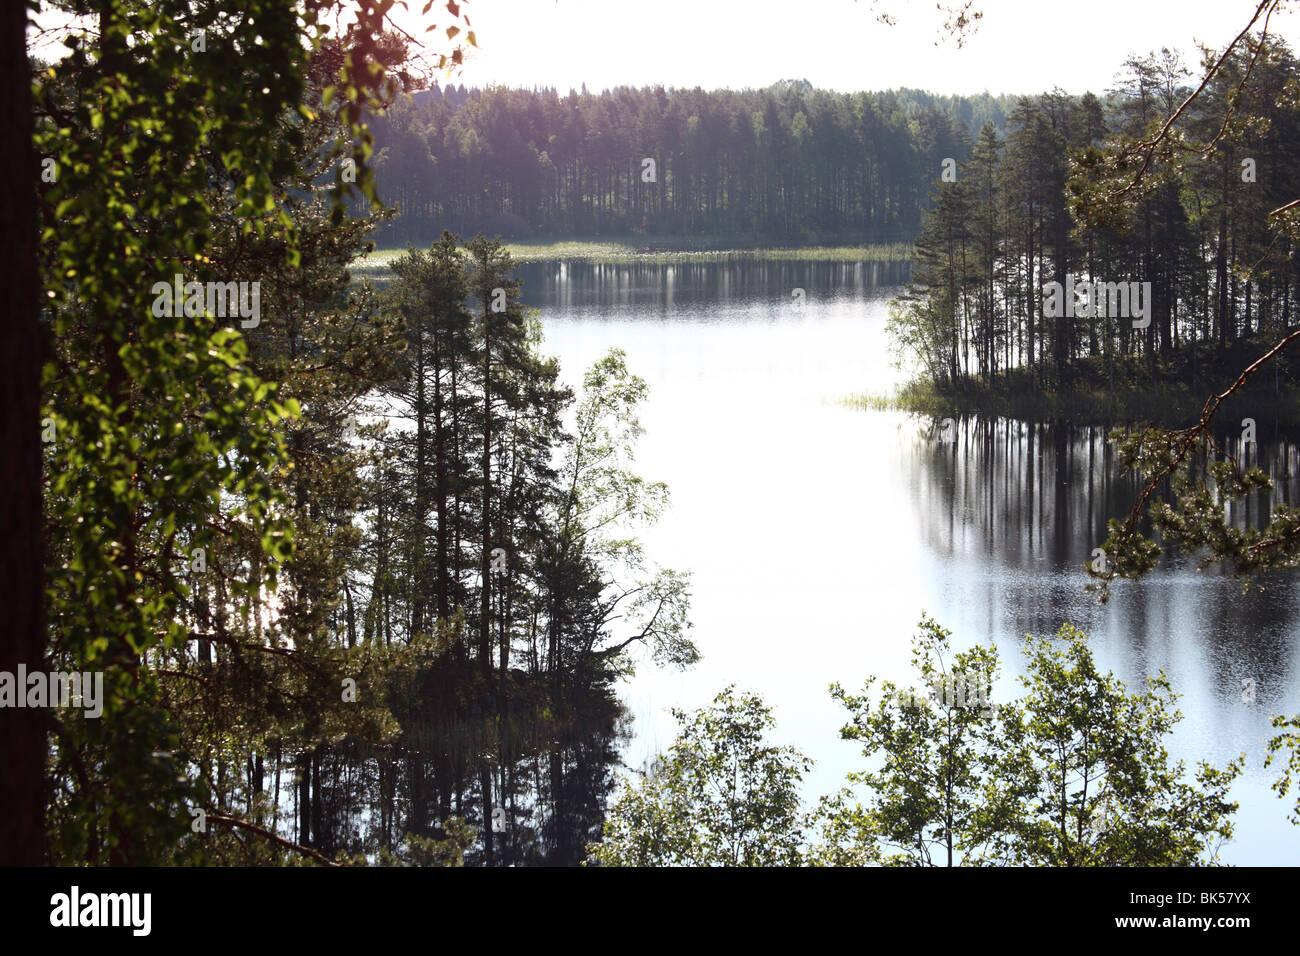 Lake Puruvesi, Punkaharju Nature Reserve, Saimaa Lake District, Savonia, Finland, Scandinavia, Europe Stock Photo